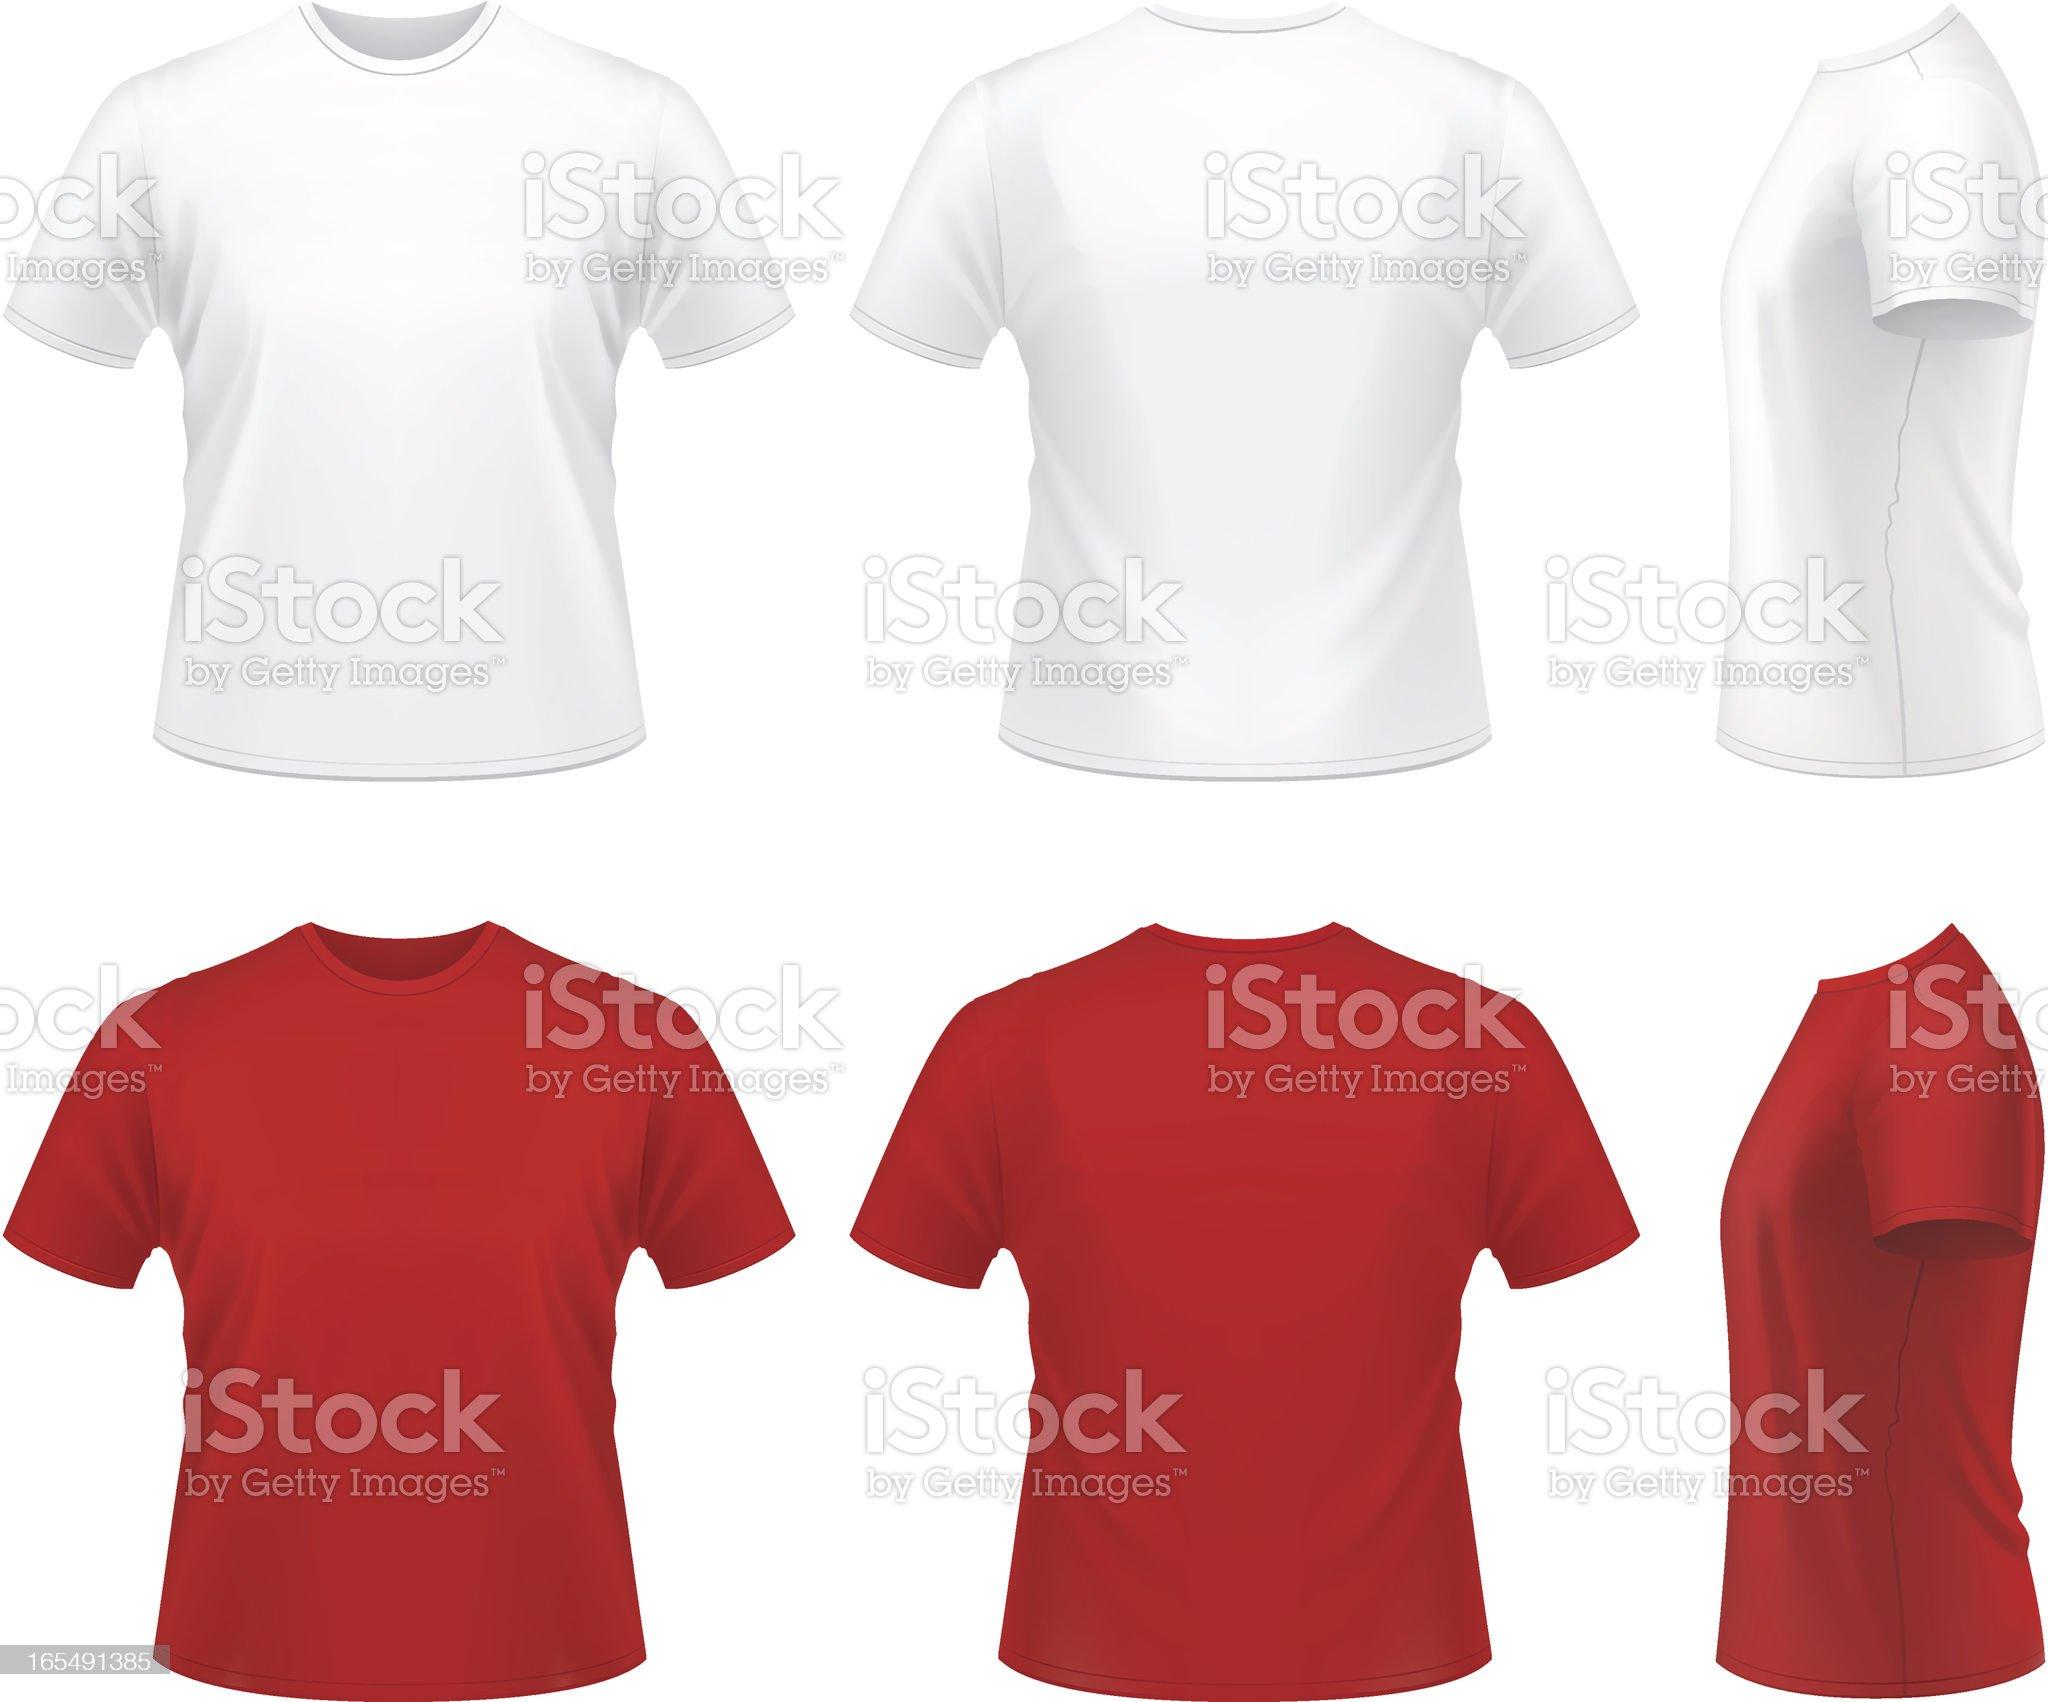 Men's T-shirt royalty-free stock vector art